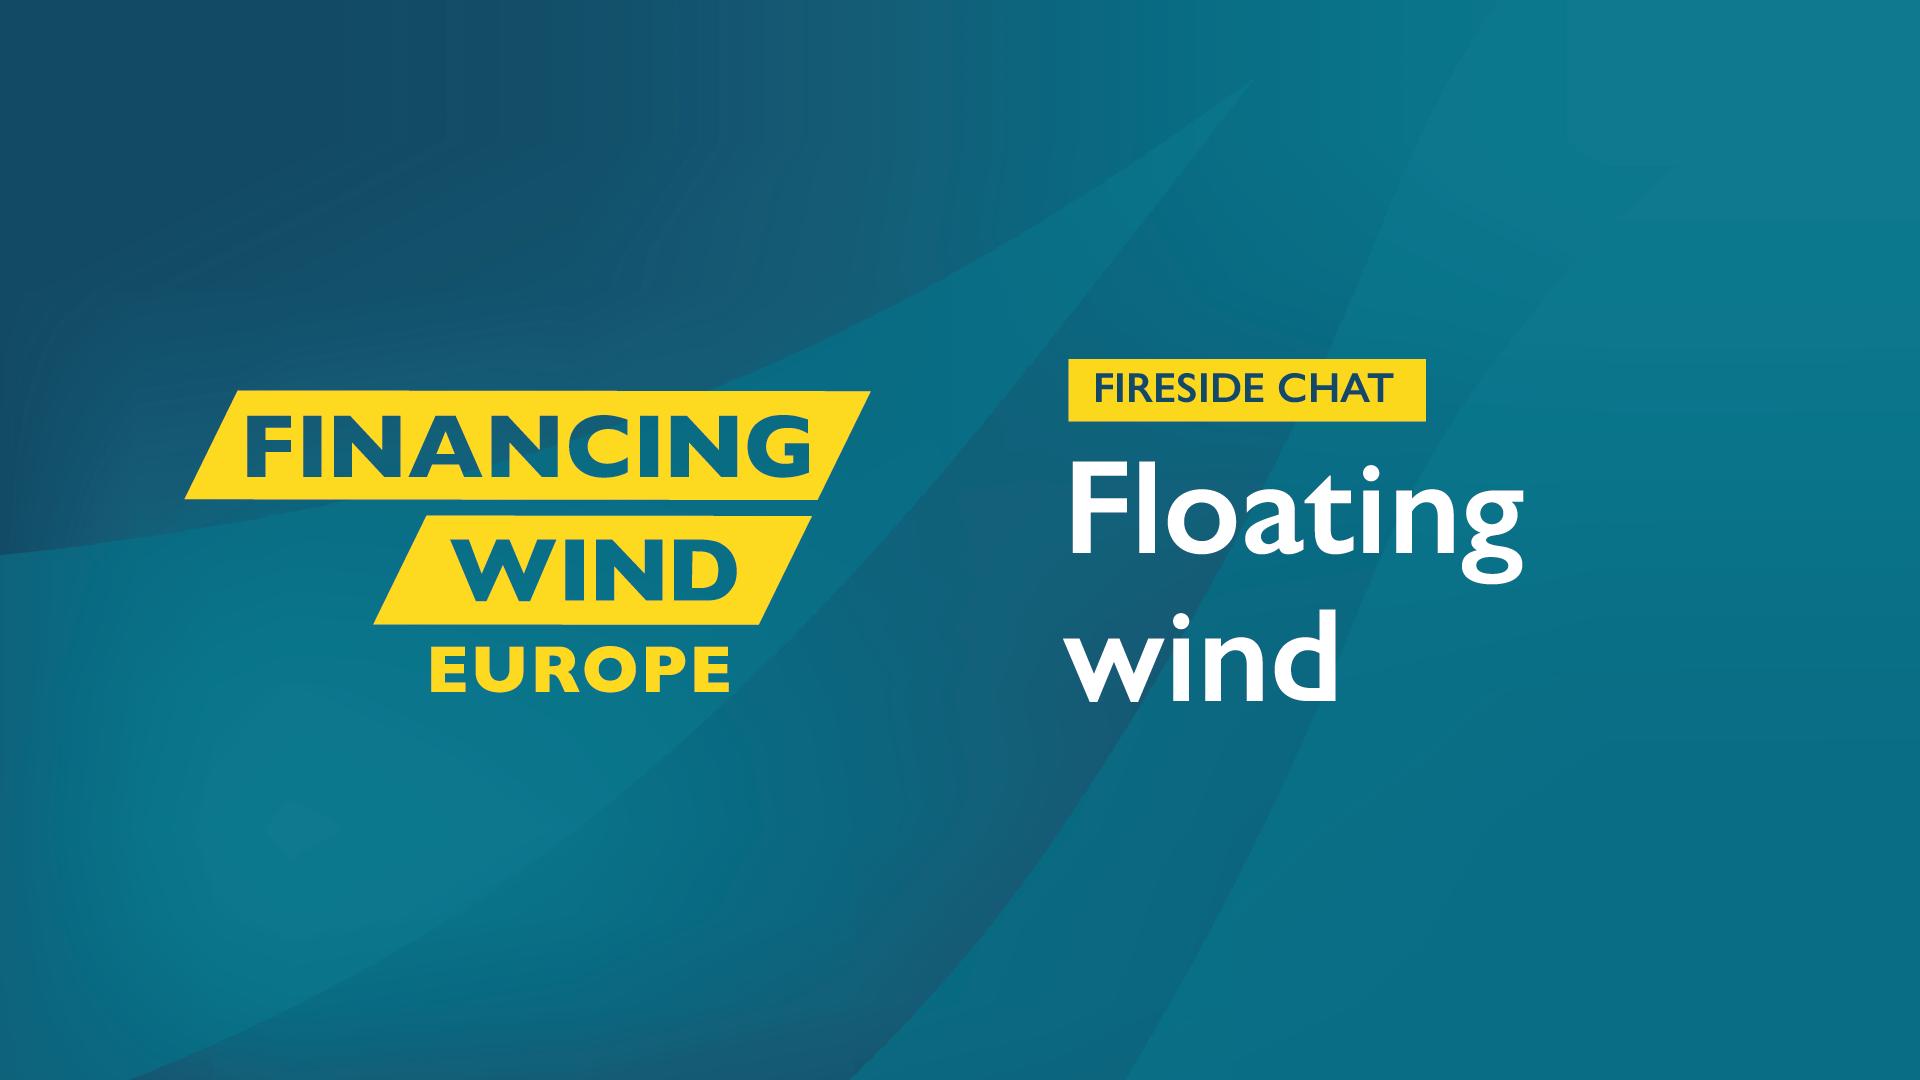 Fireside Chat: Floating wind